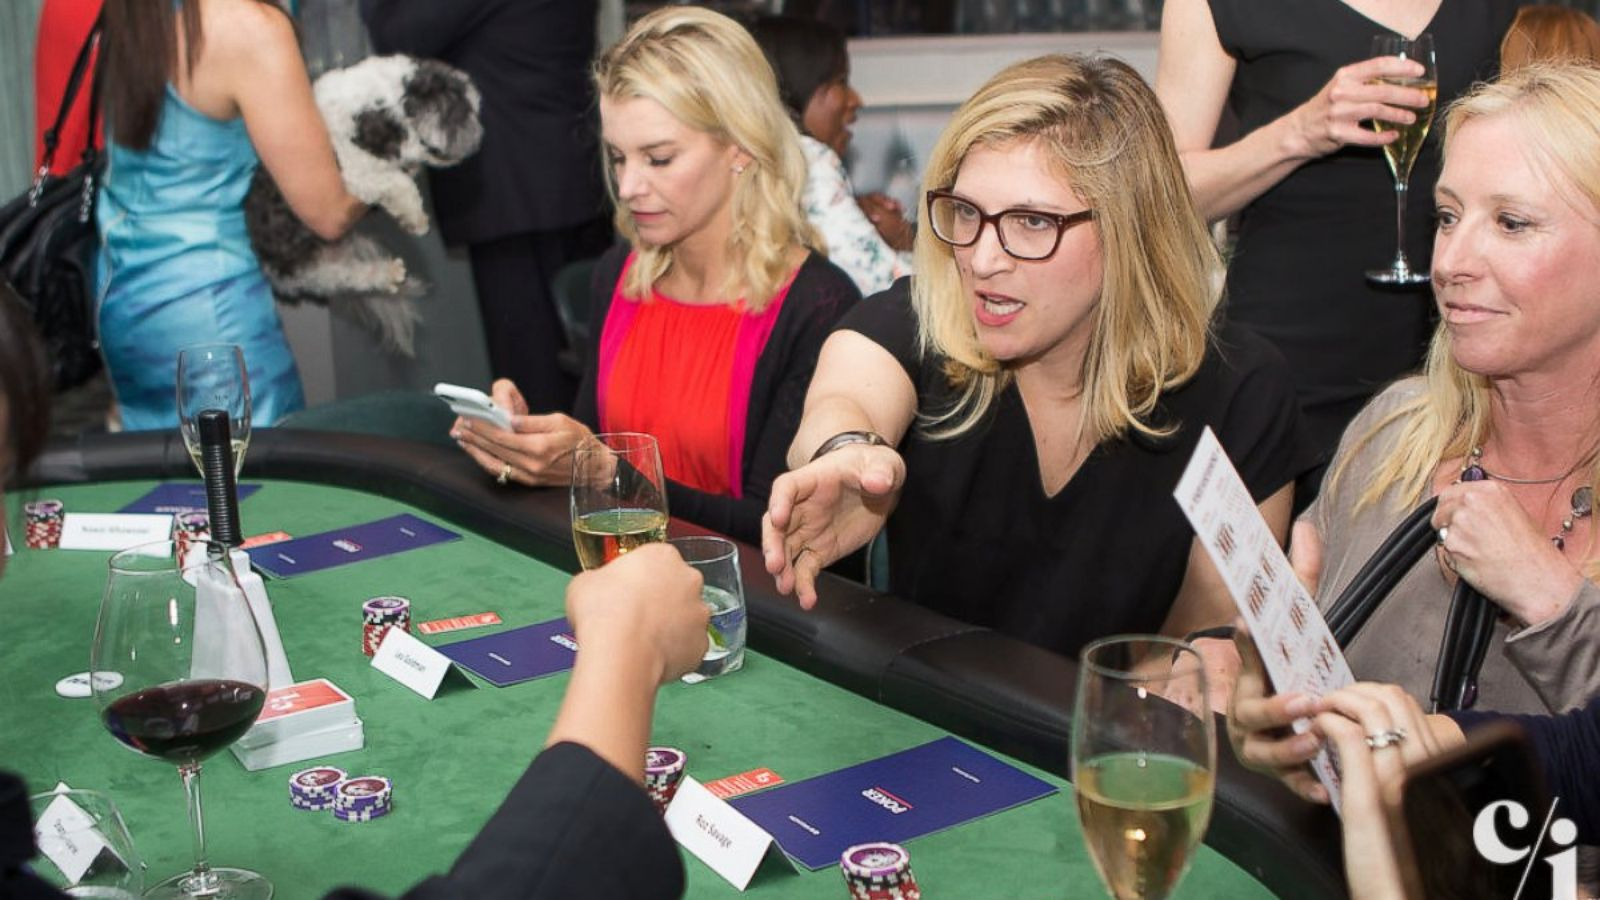 Women Only Poker Tournament A Bet On Career Advancement Abc News